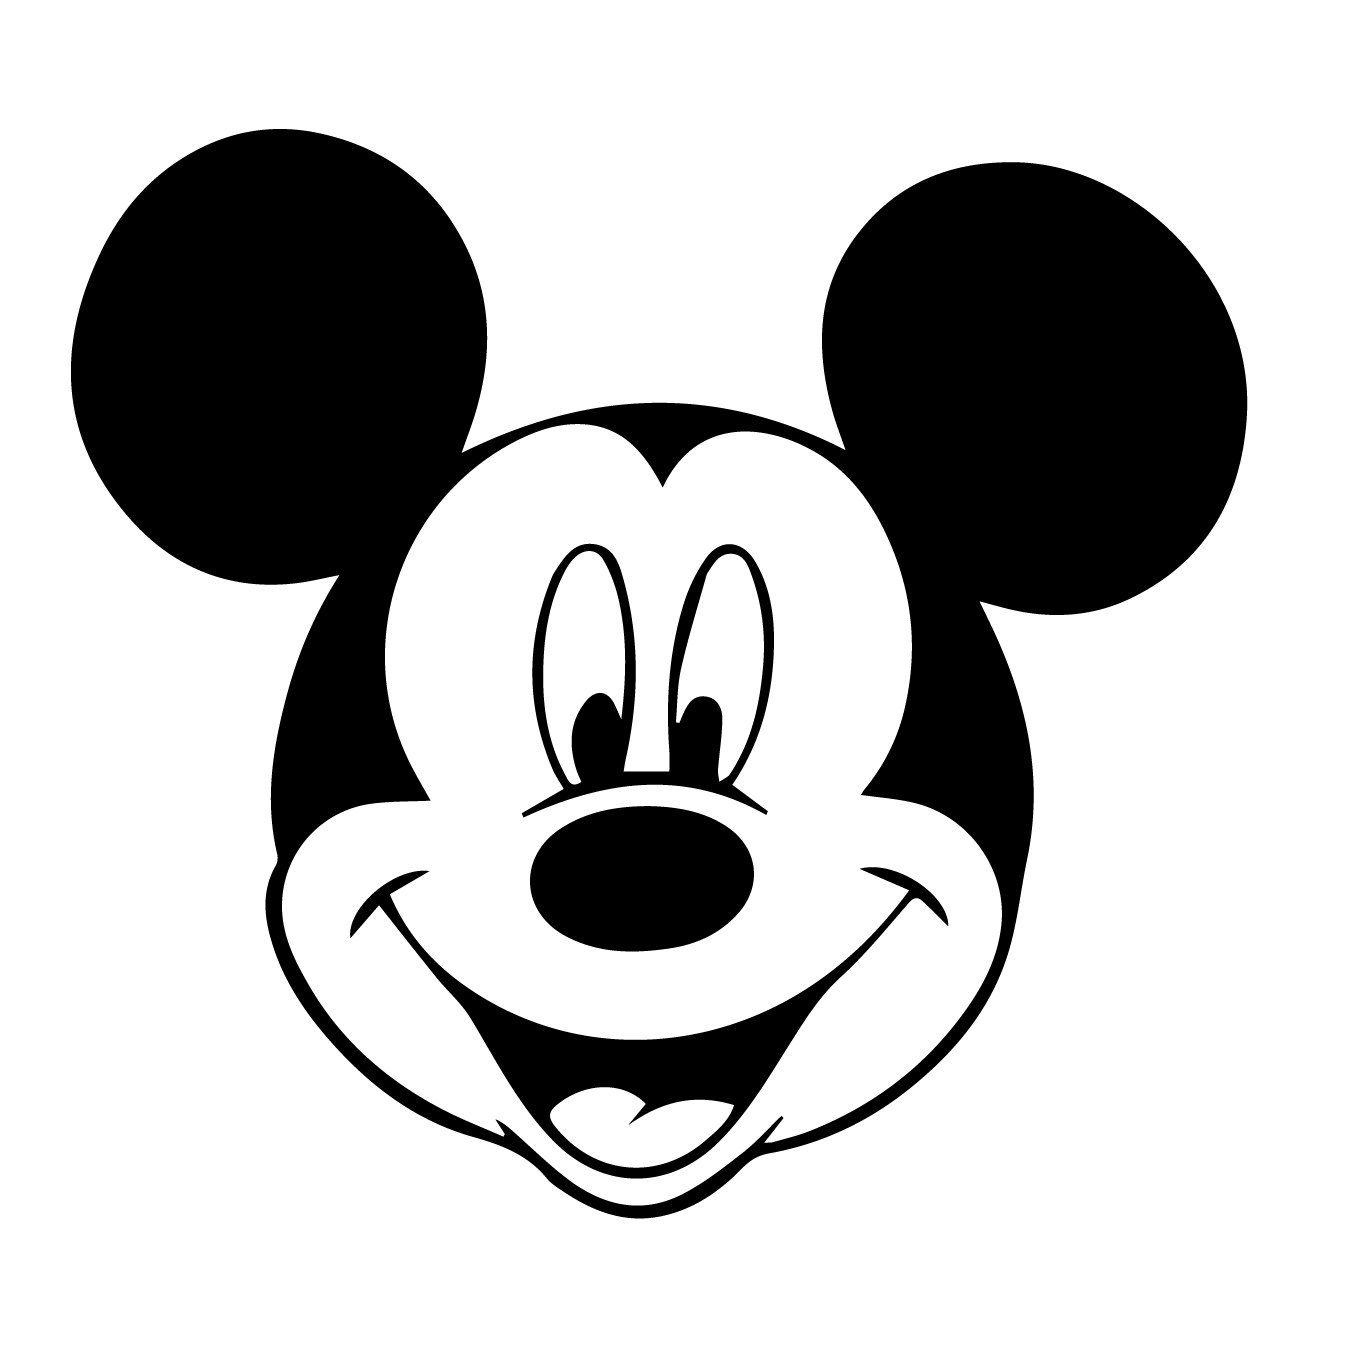 Mickey mouse svg,Walt disney eps, Mickey mouse silhouette,Walt ...